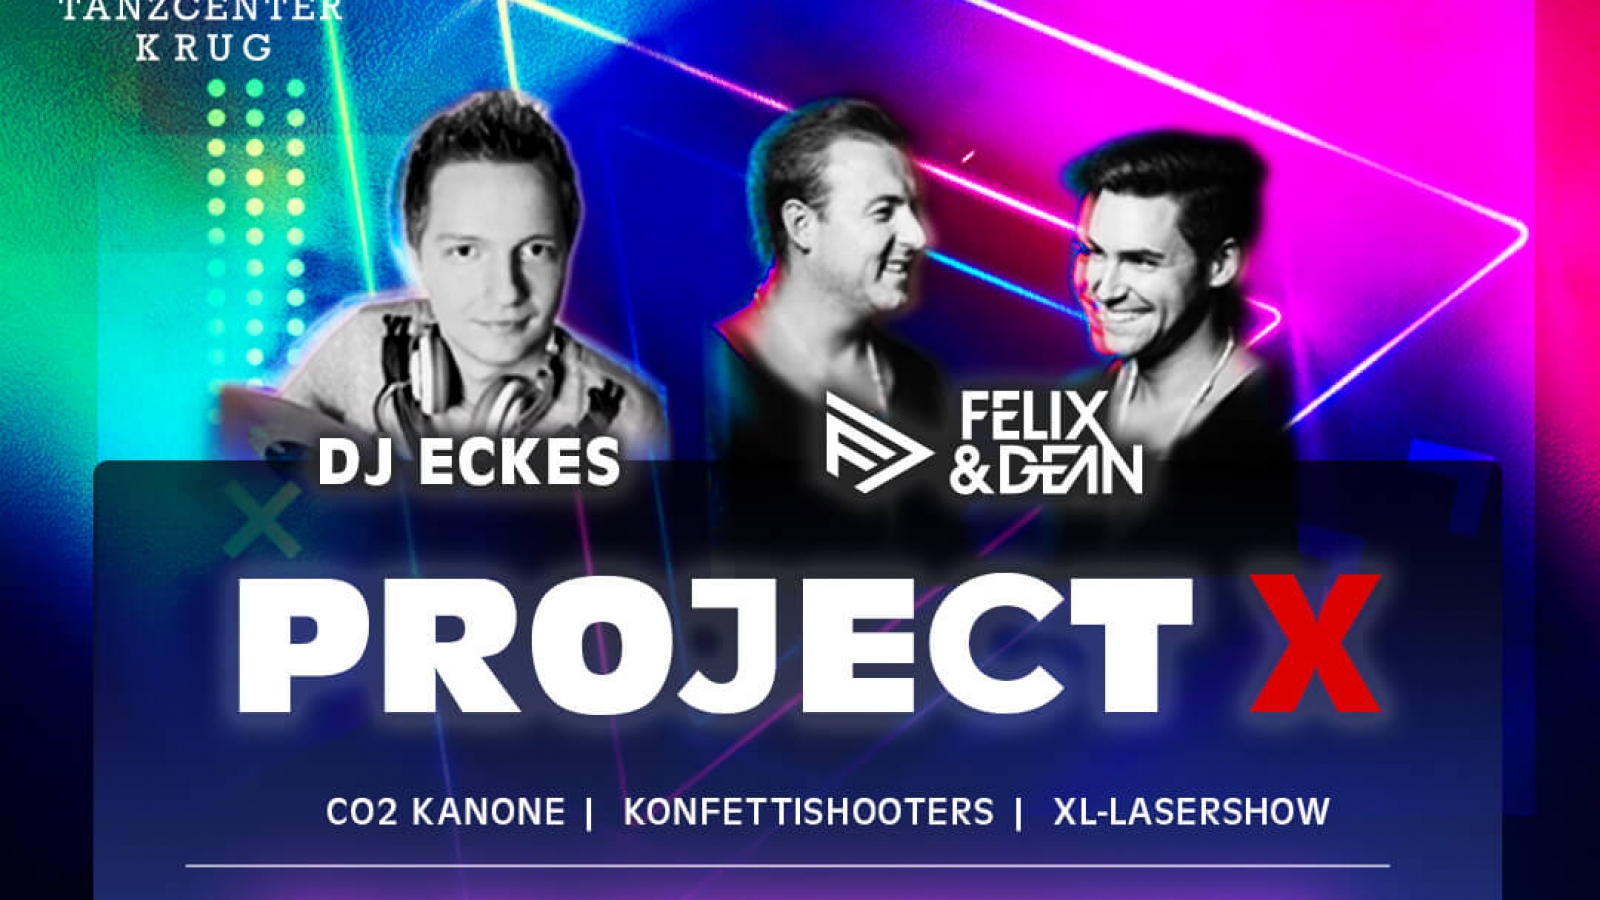 PROJECT-X Party Tanzcenter Krug Breitenlesau Instagram